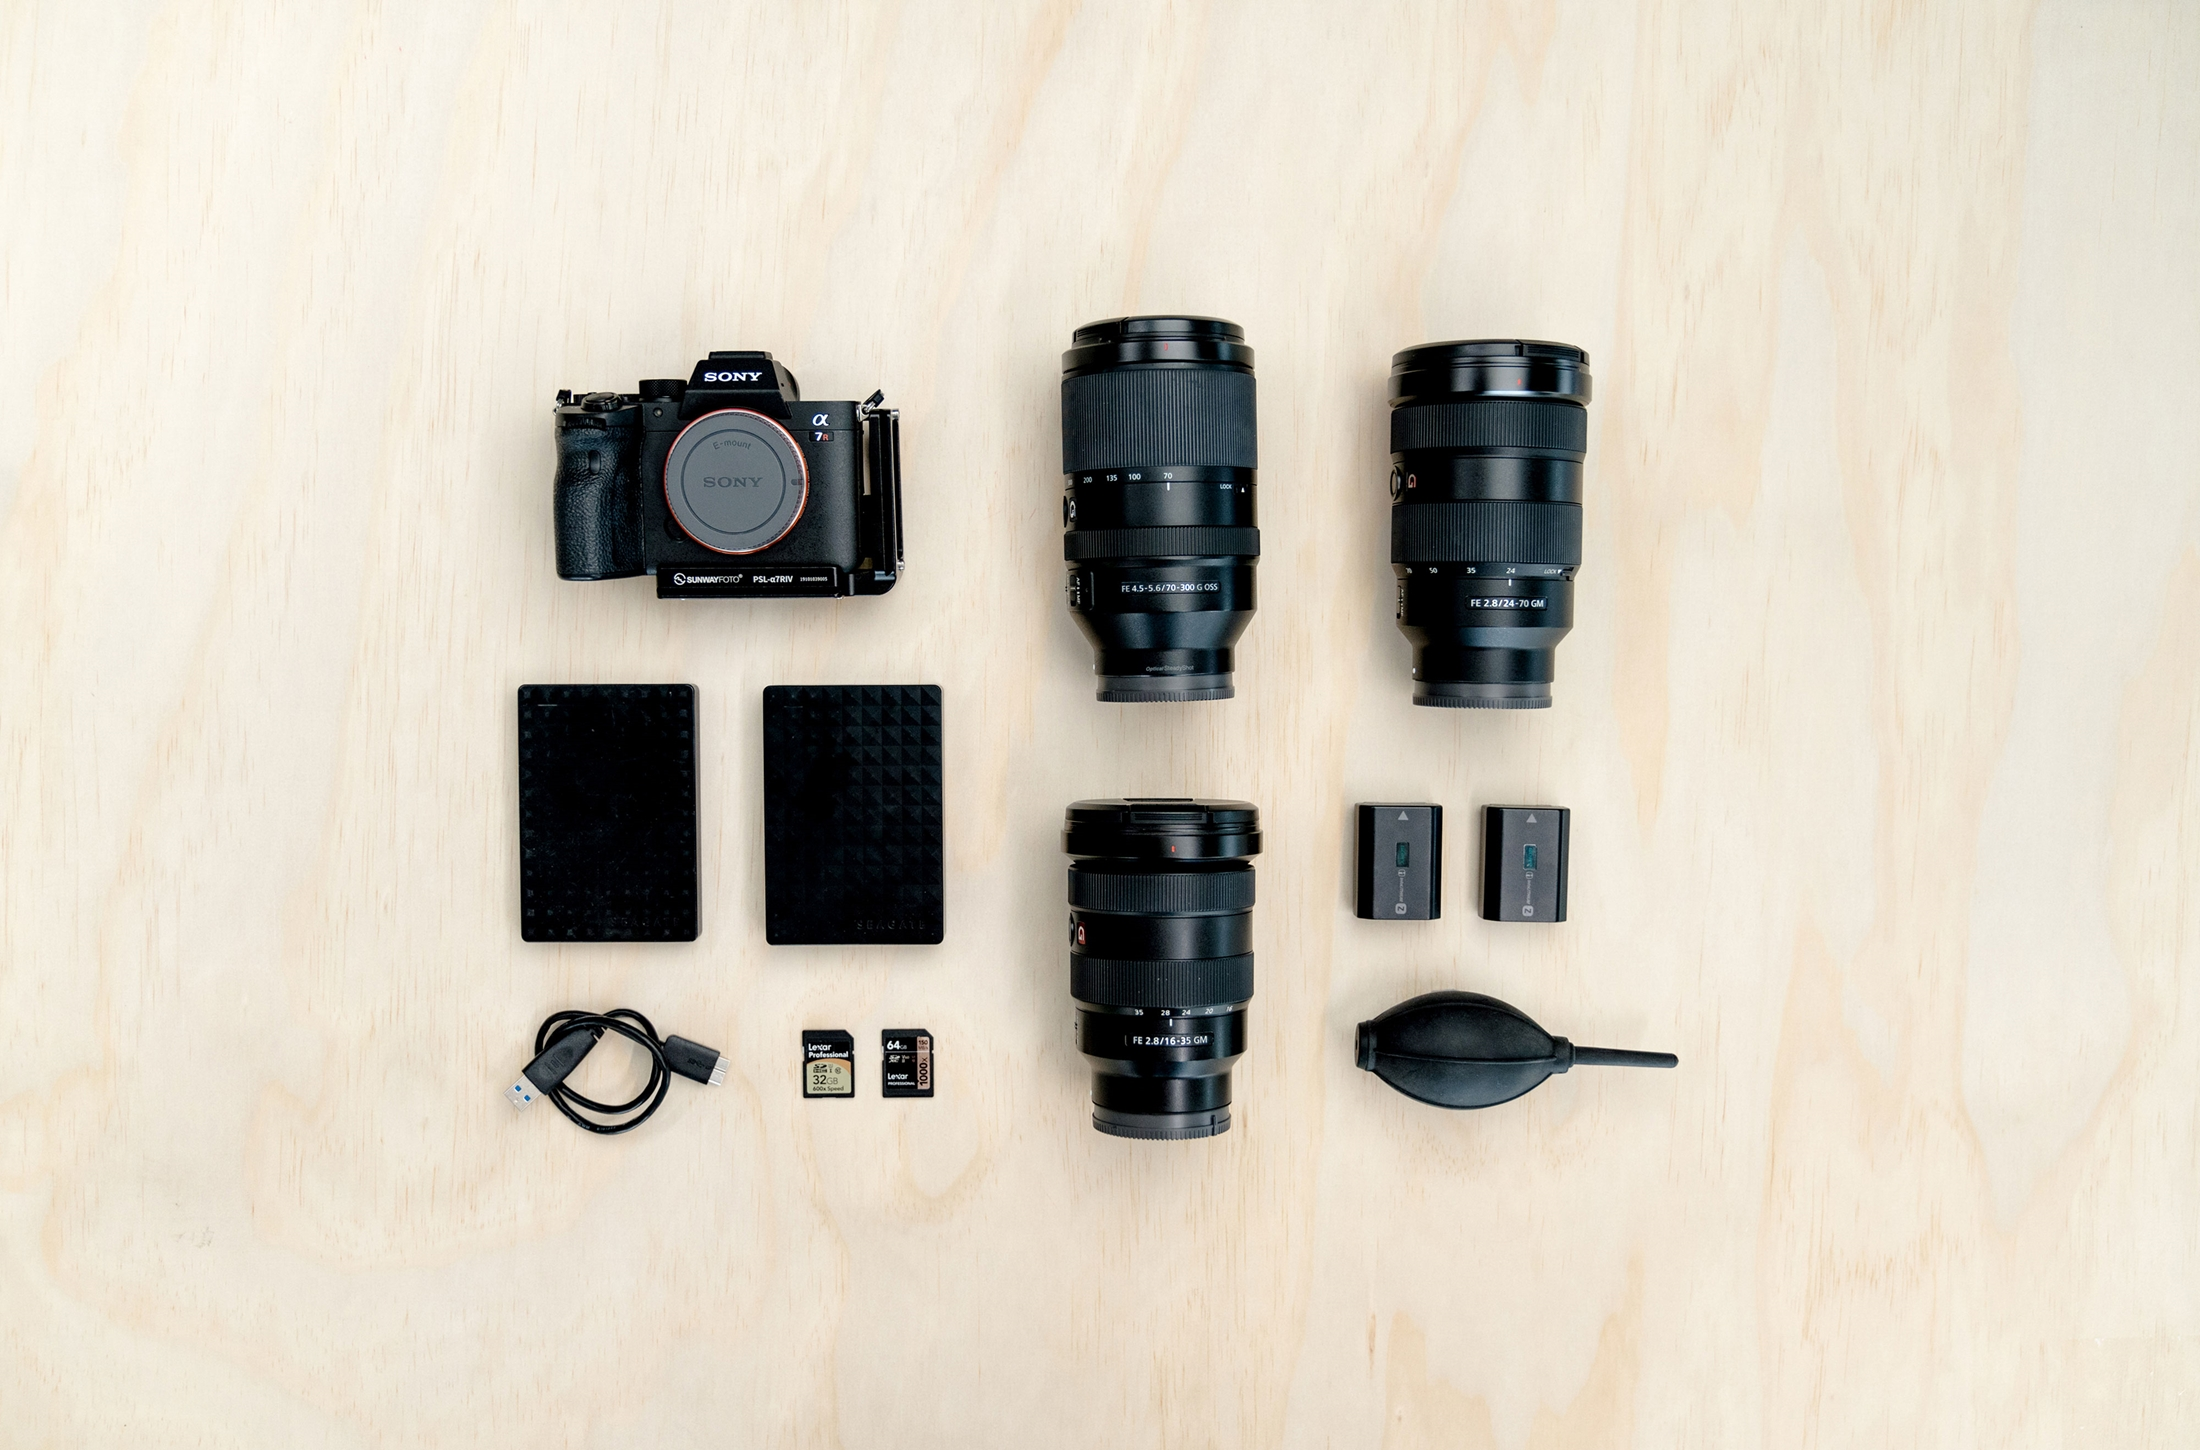 Meghan's Camera Kit Image Map